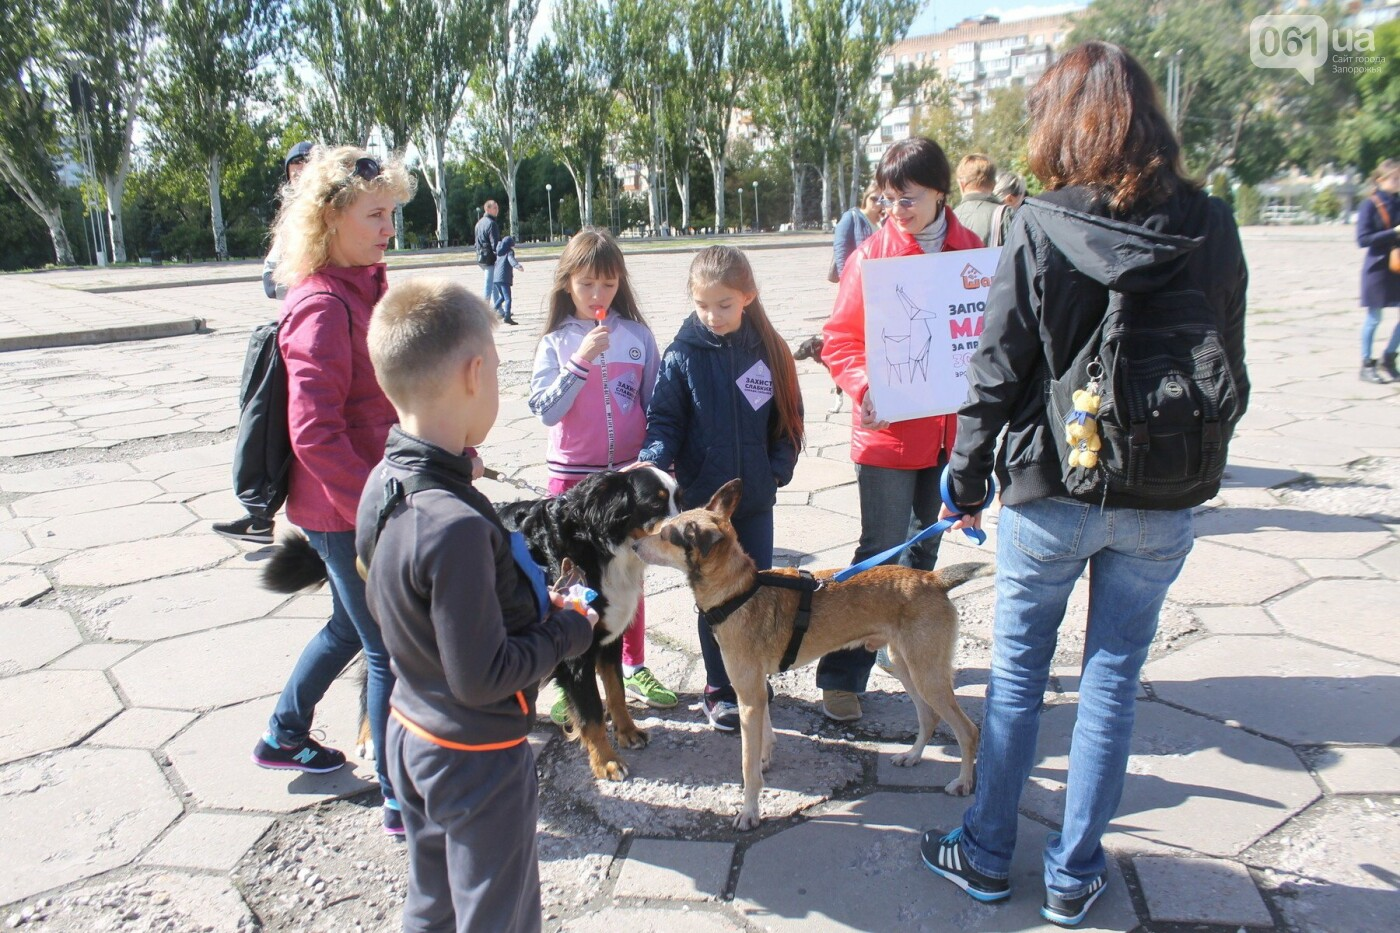 «Защити! Не мучай»: в Запорожье провели марш за права животных, – ФОТОРЕПОРТАЖ, ВИДЕО, фото-19